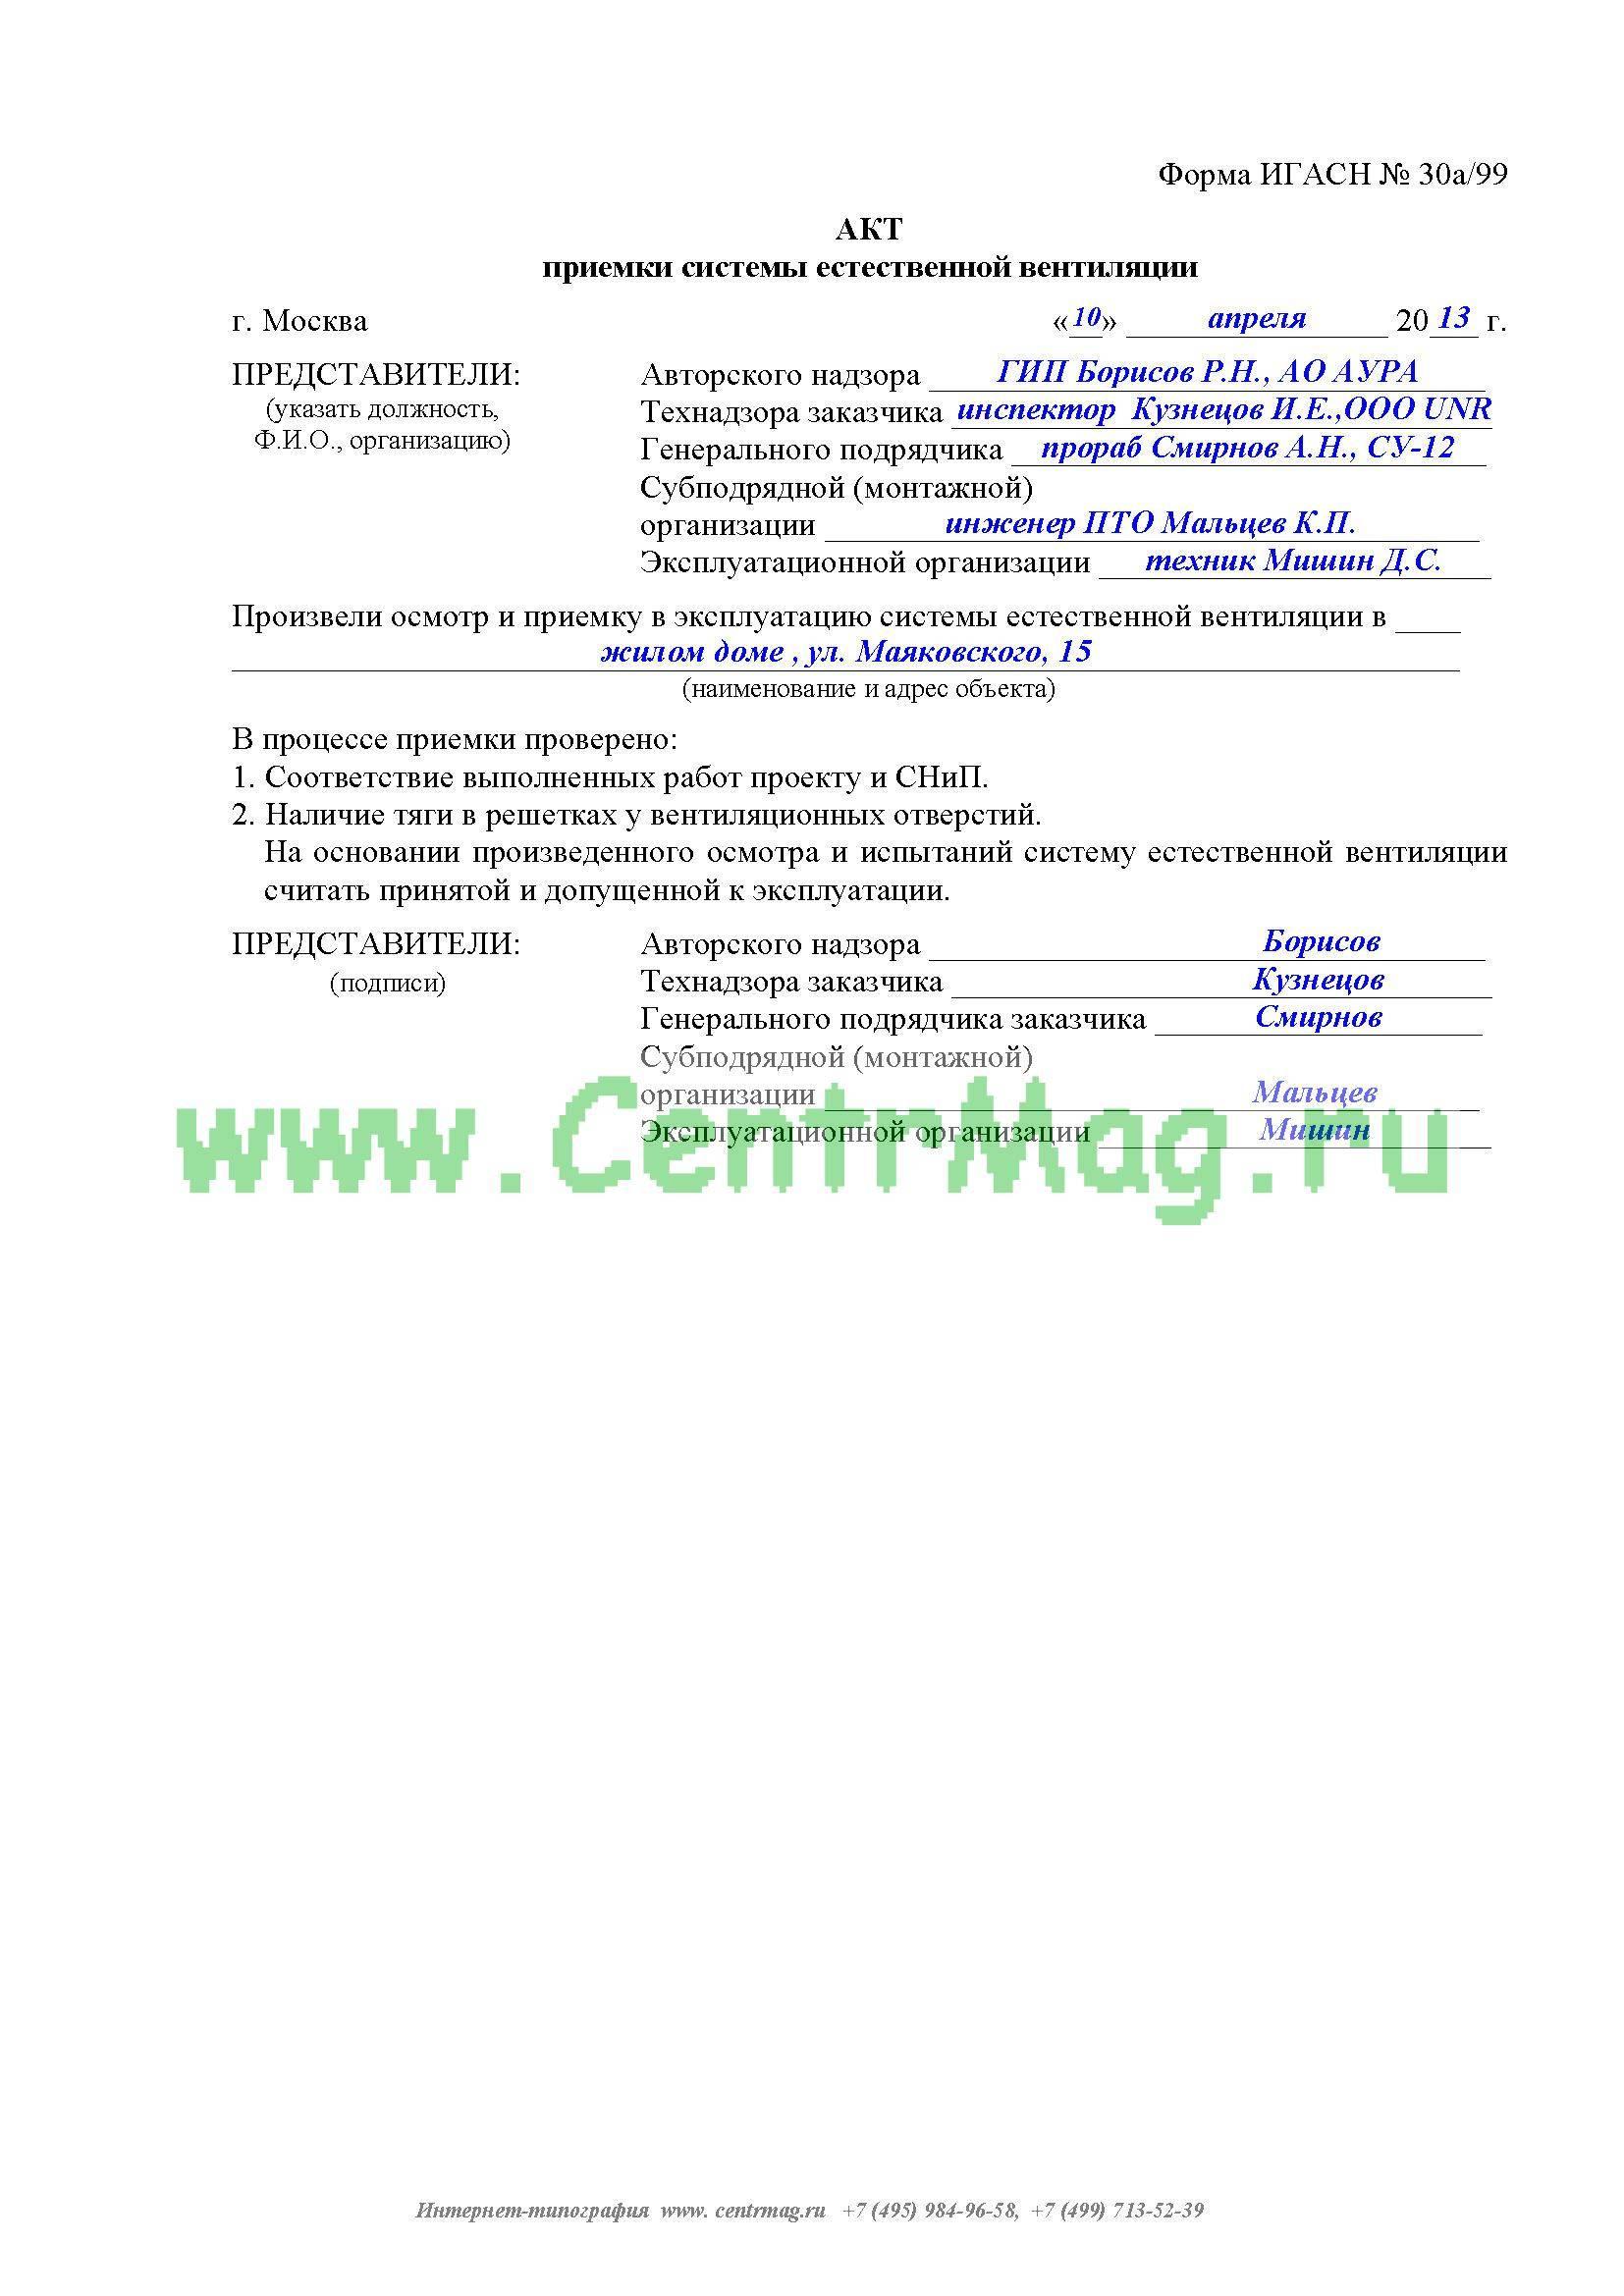 Акт проверки системы вентиляции в доу образец. акт проверки эффективности вентиляции